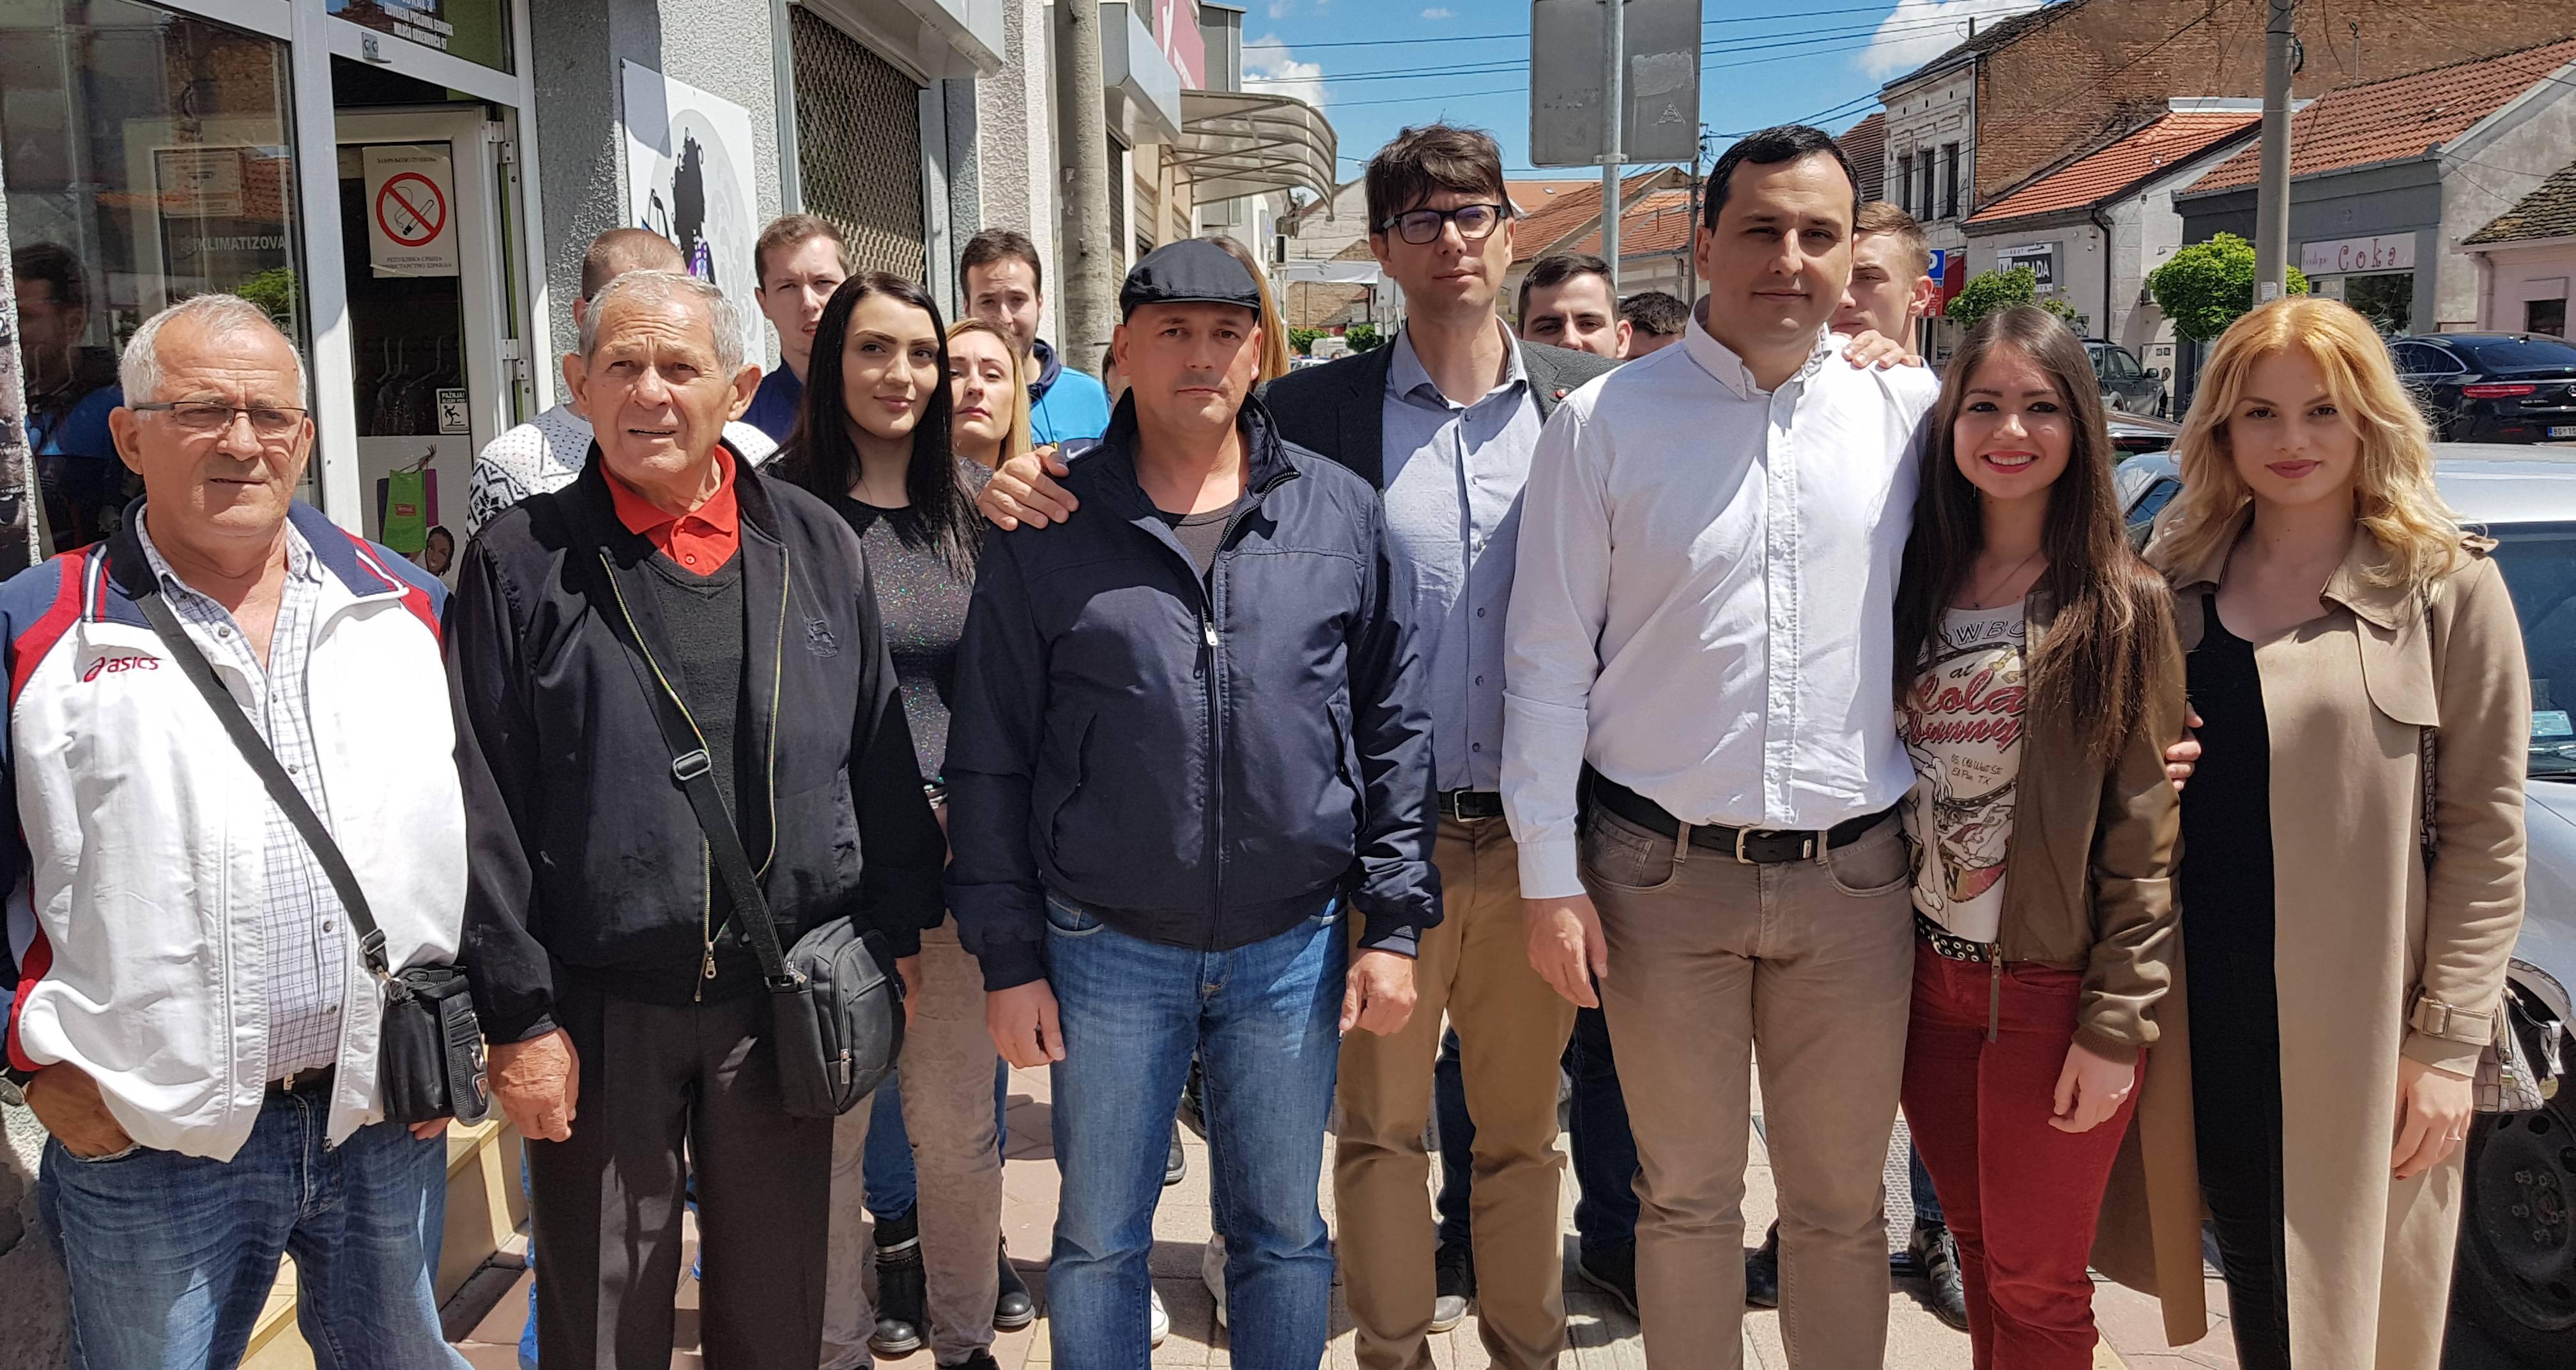 Народна странка обележила годишњицу поплава у Обреновцу и предложила низ мера